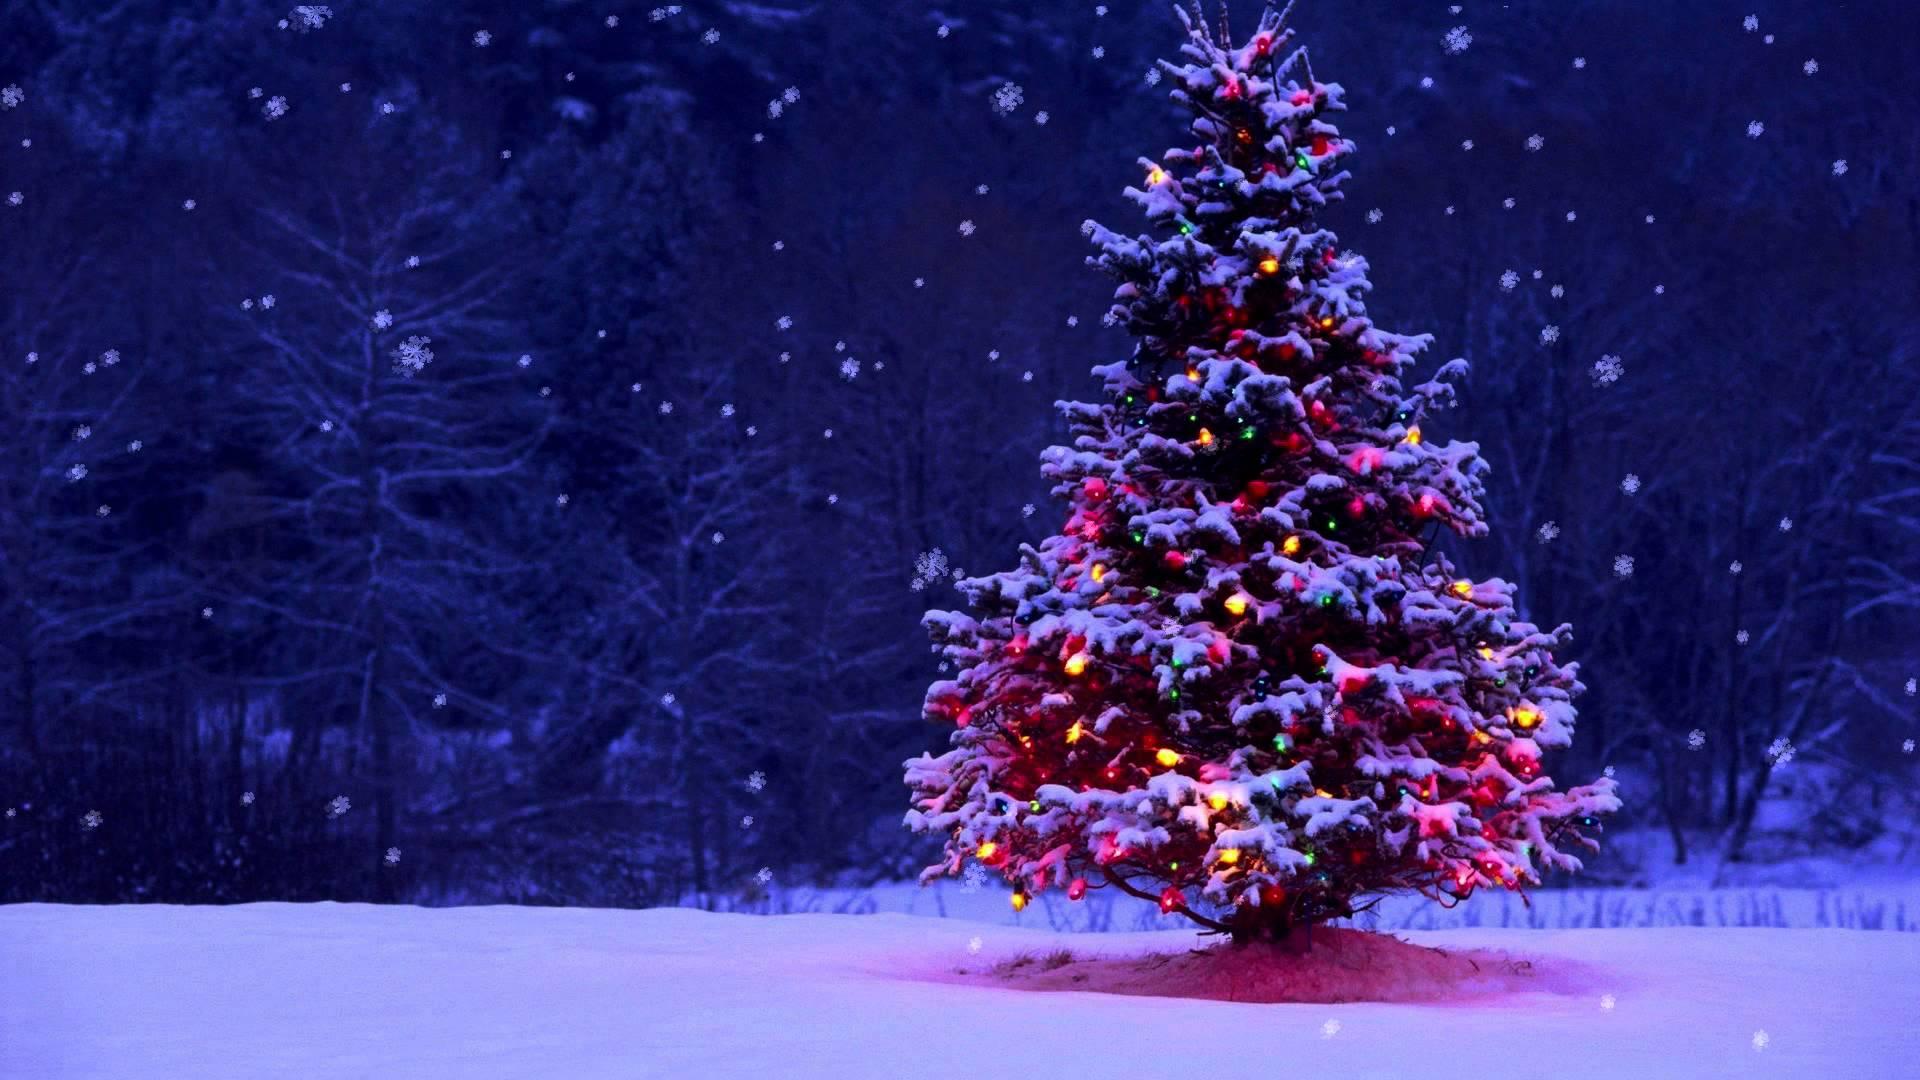 FourVision Happy Holidays Christmas tree